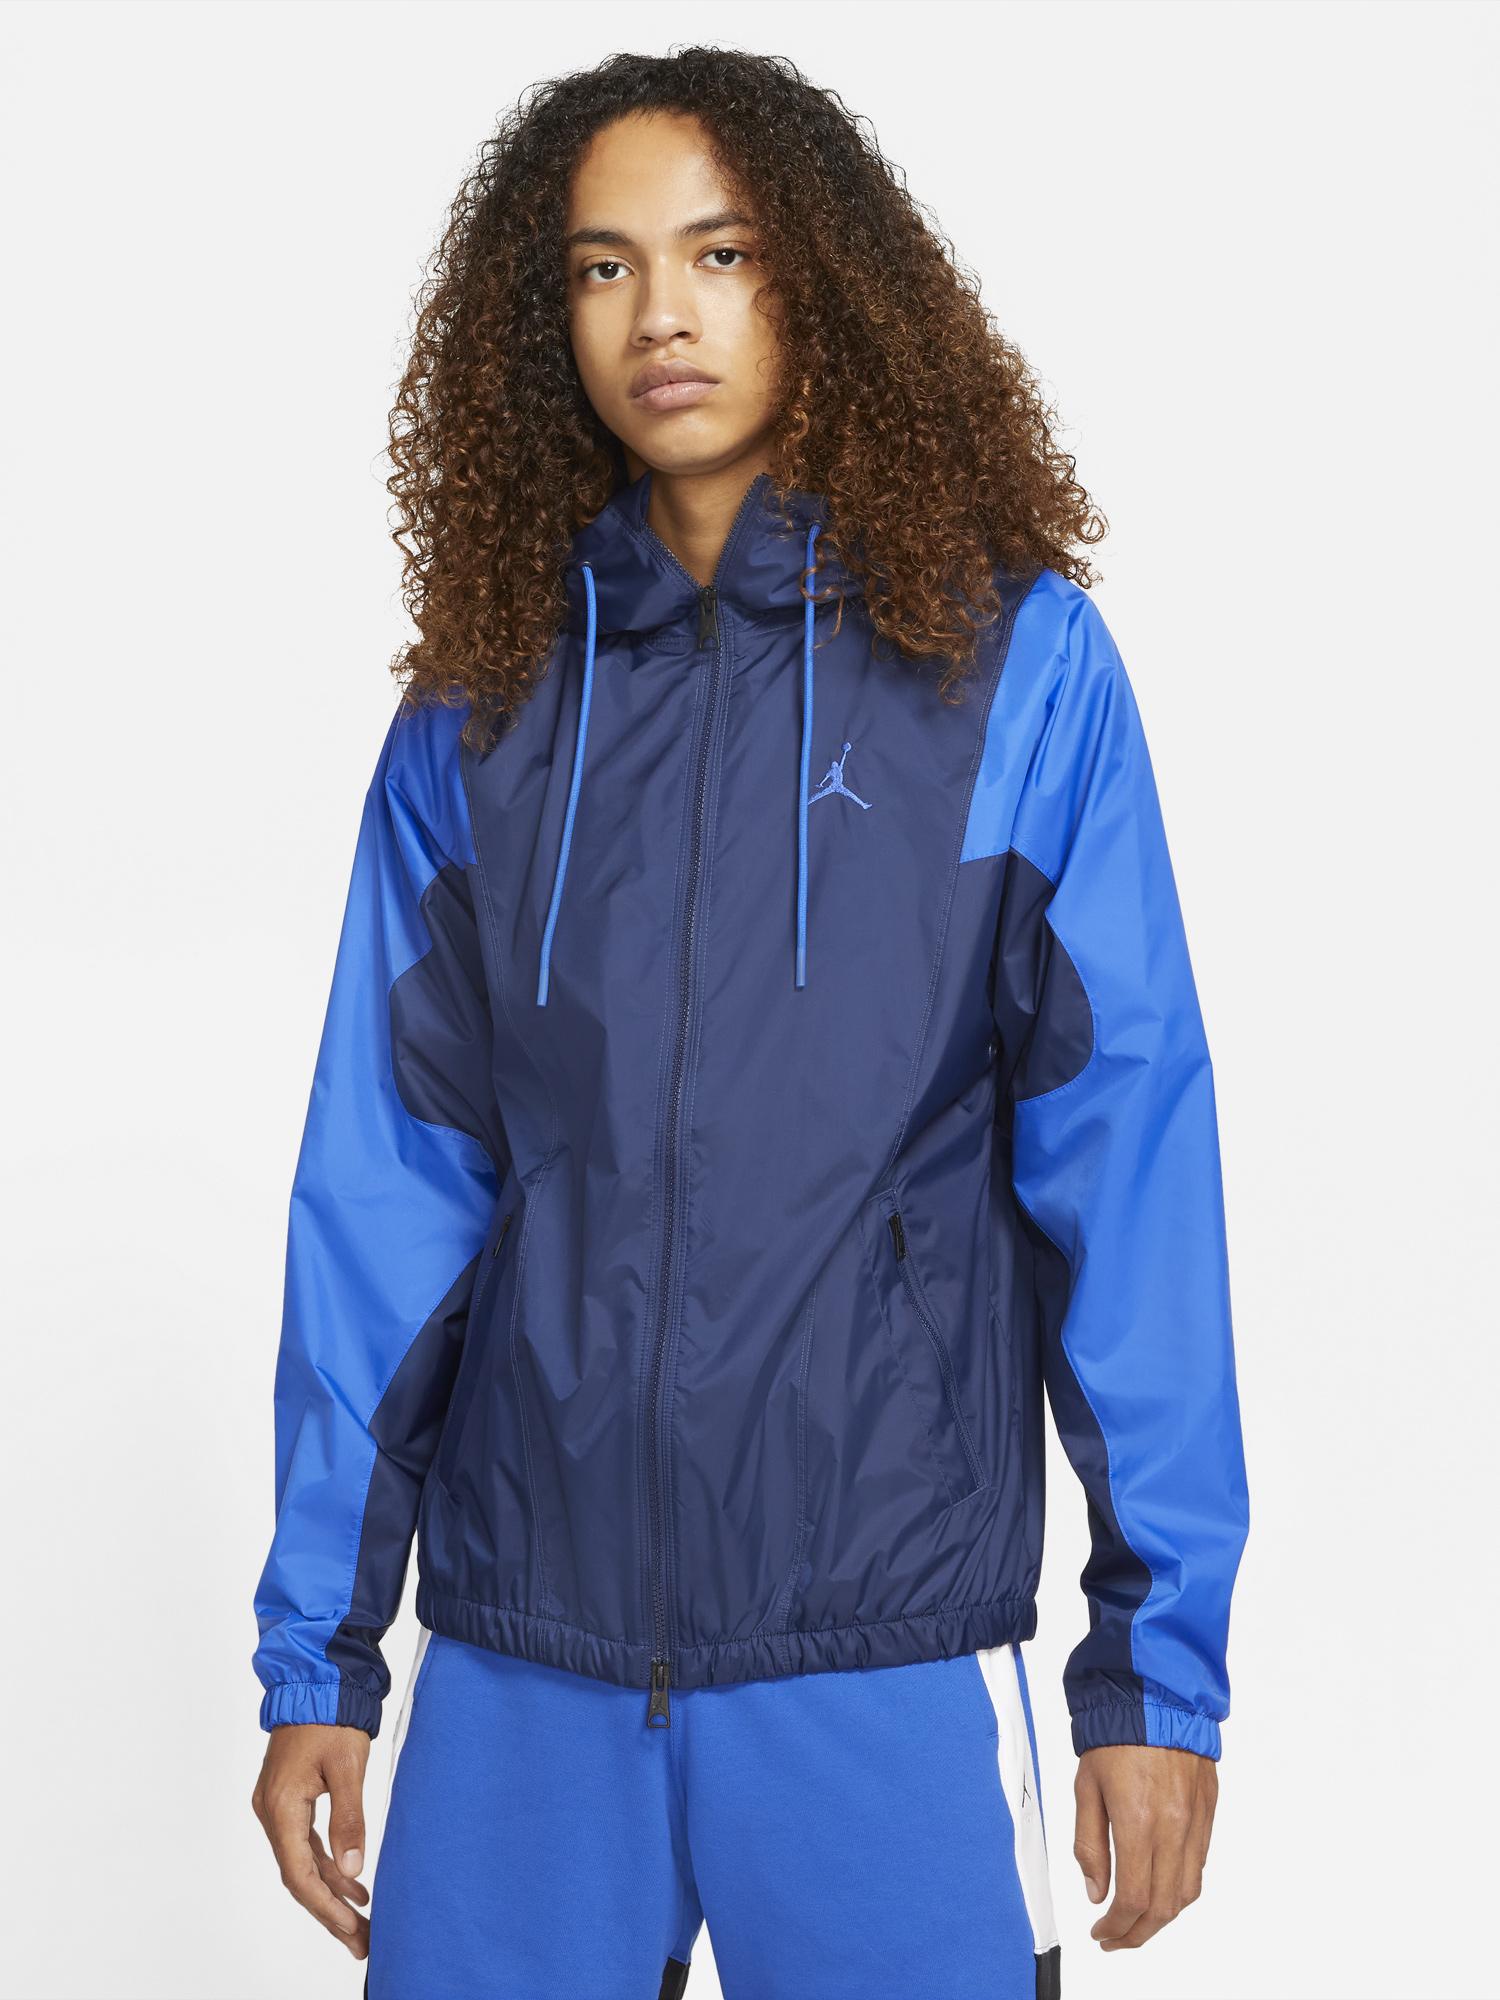 jordan-essential-woven-jacket-hyper-royal-midnight-navy-1